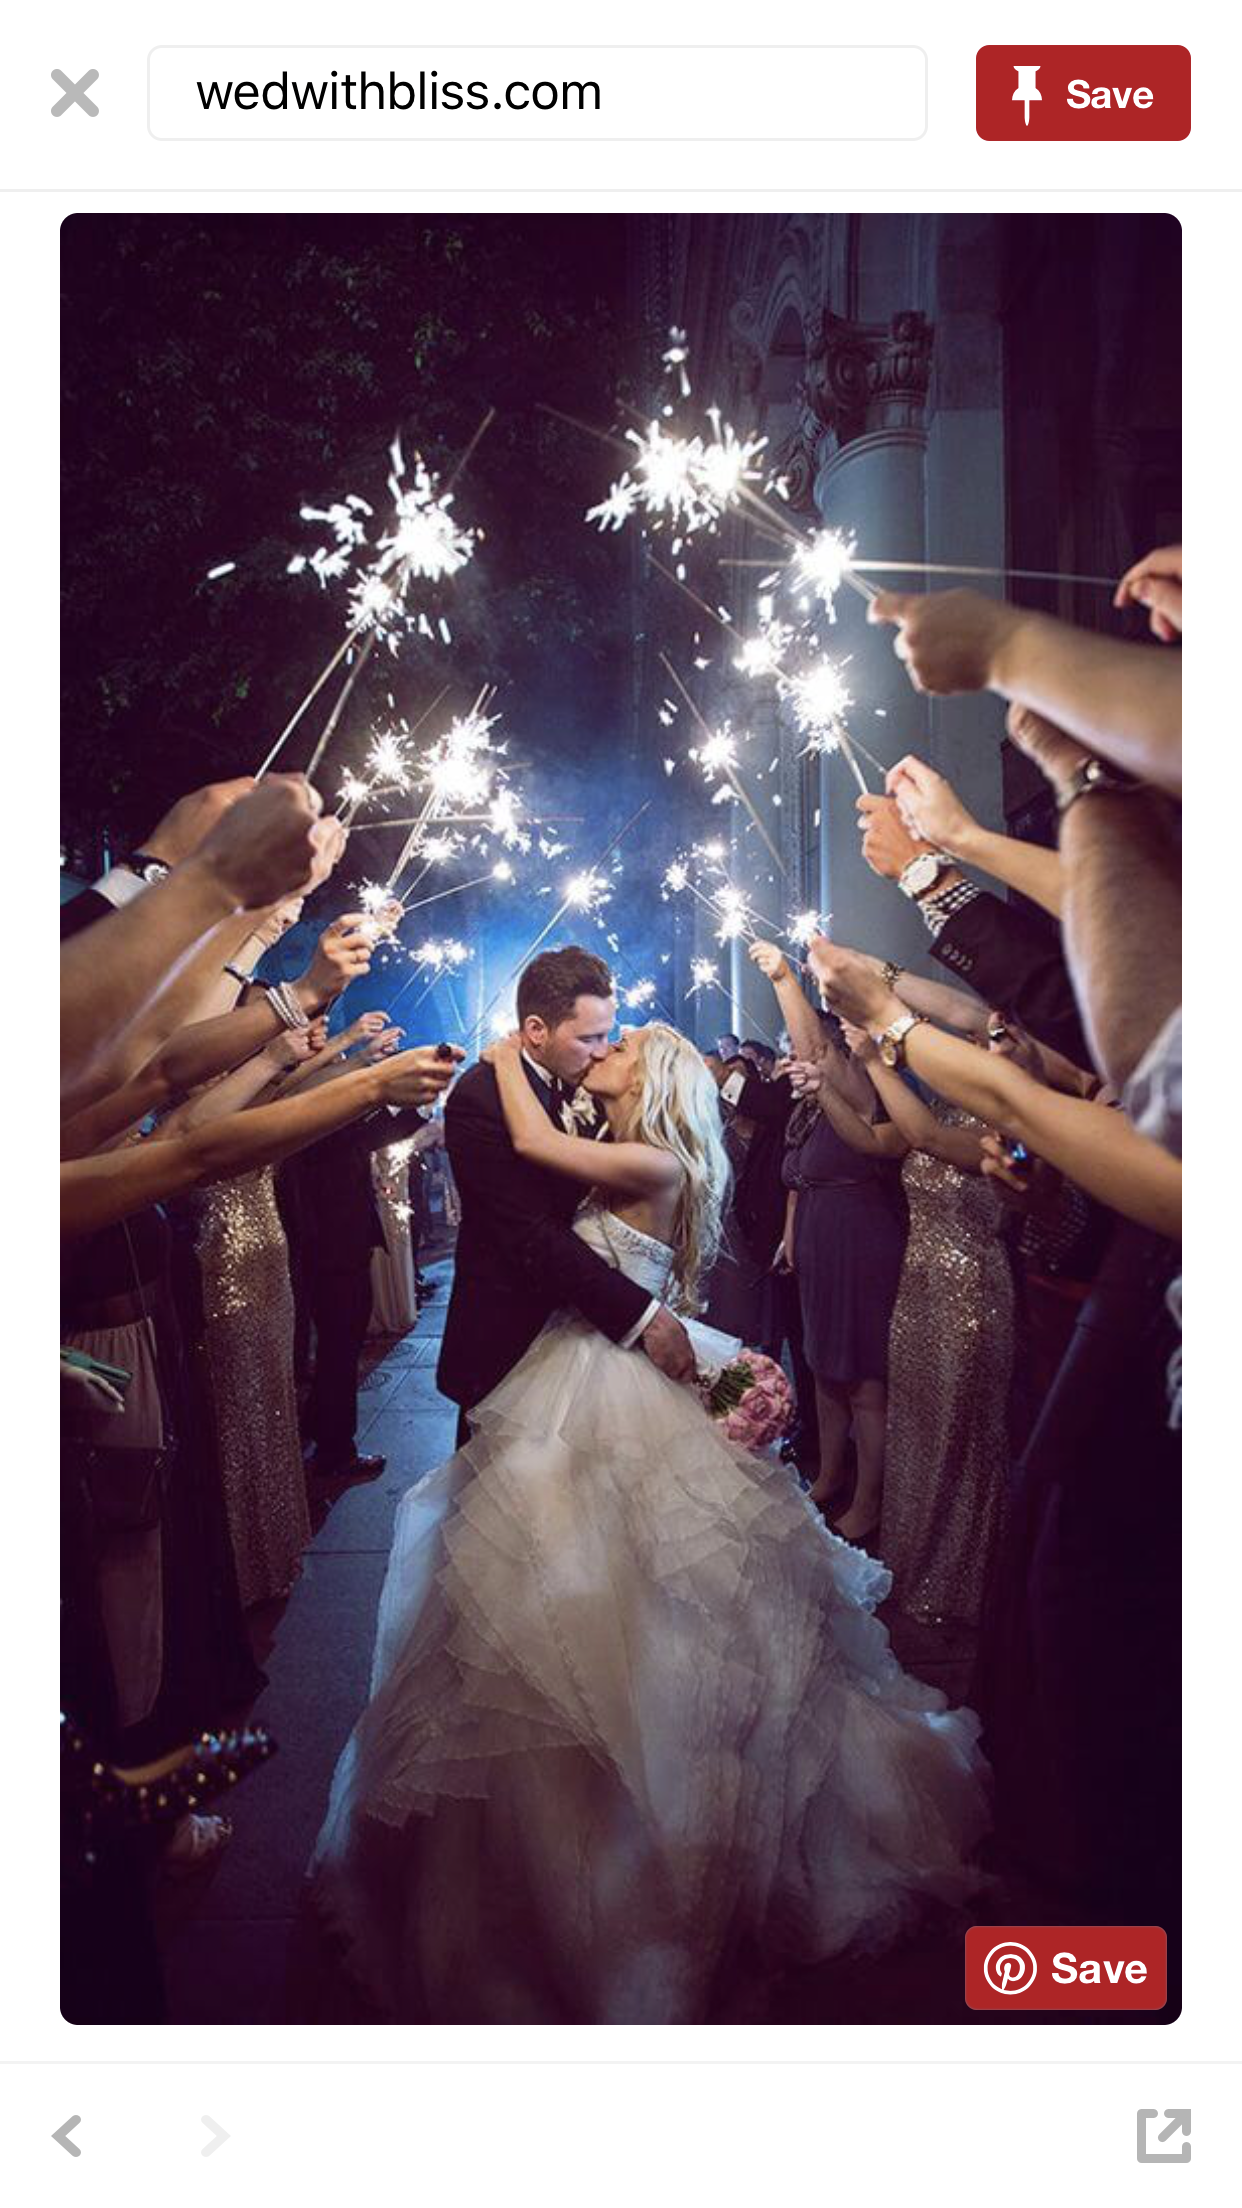 Pin by iat on γάμος in pinterest weddings